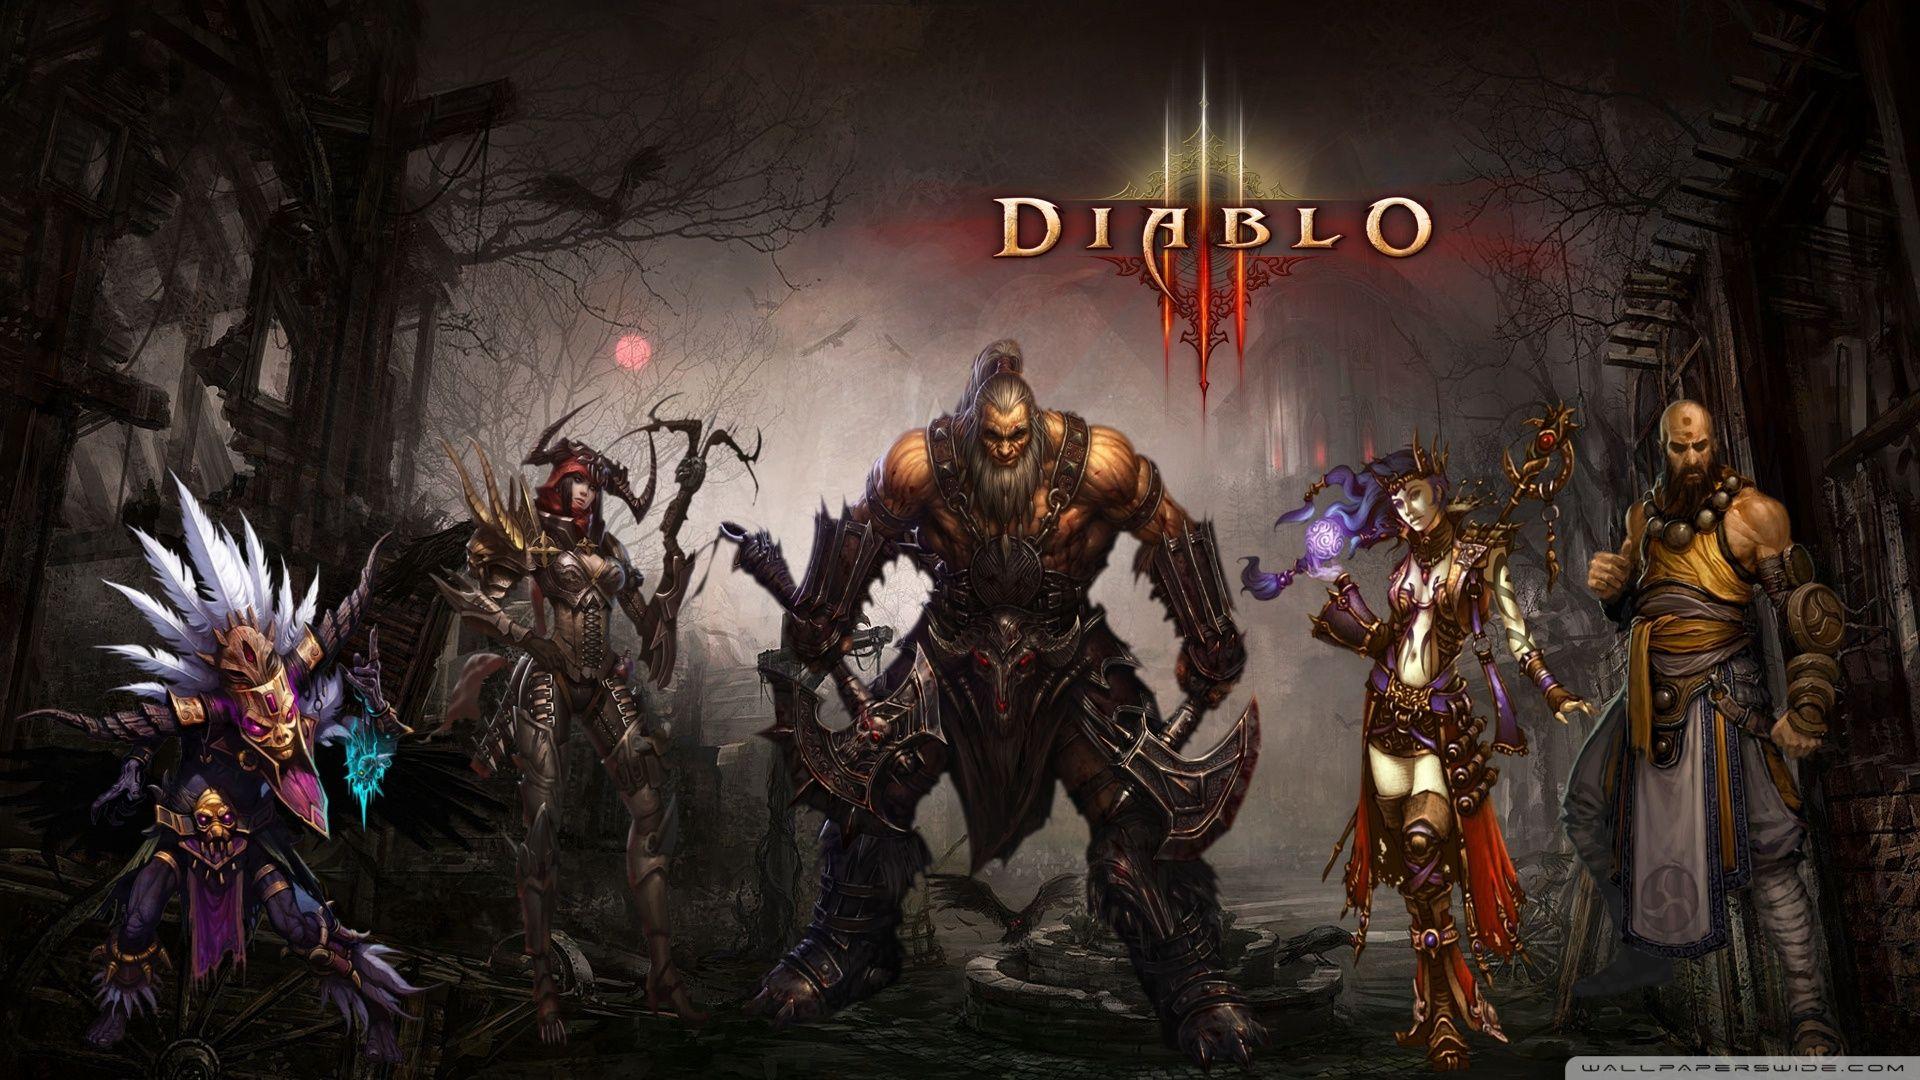 Diablo HD Wallpapers Widescreen 1920—1080 Diablo 3 Wallpapers